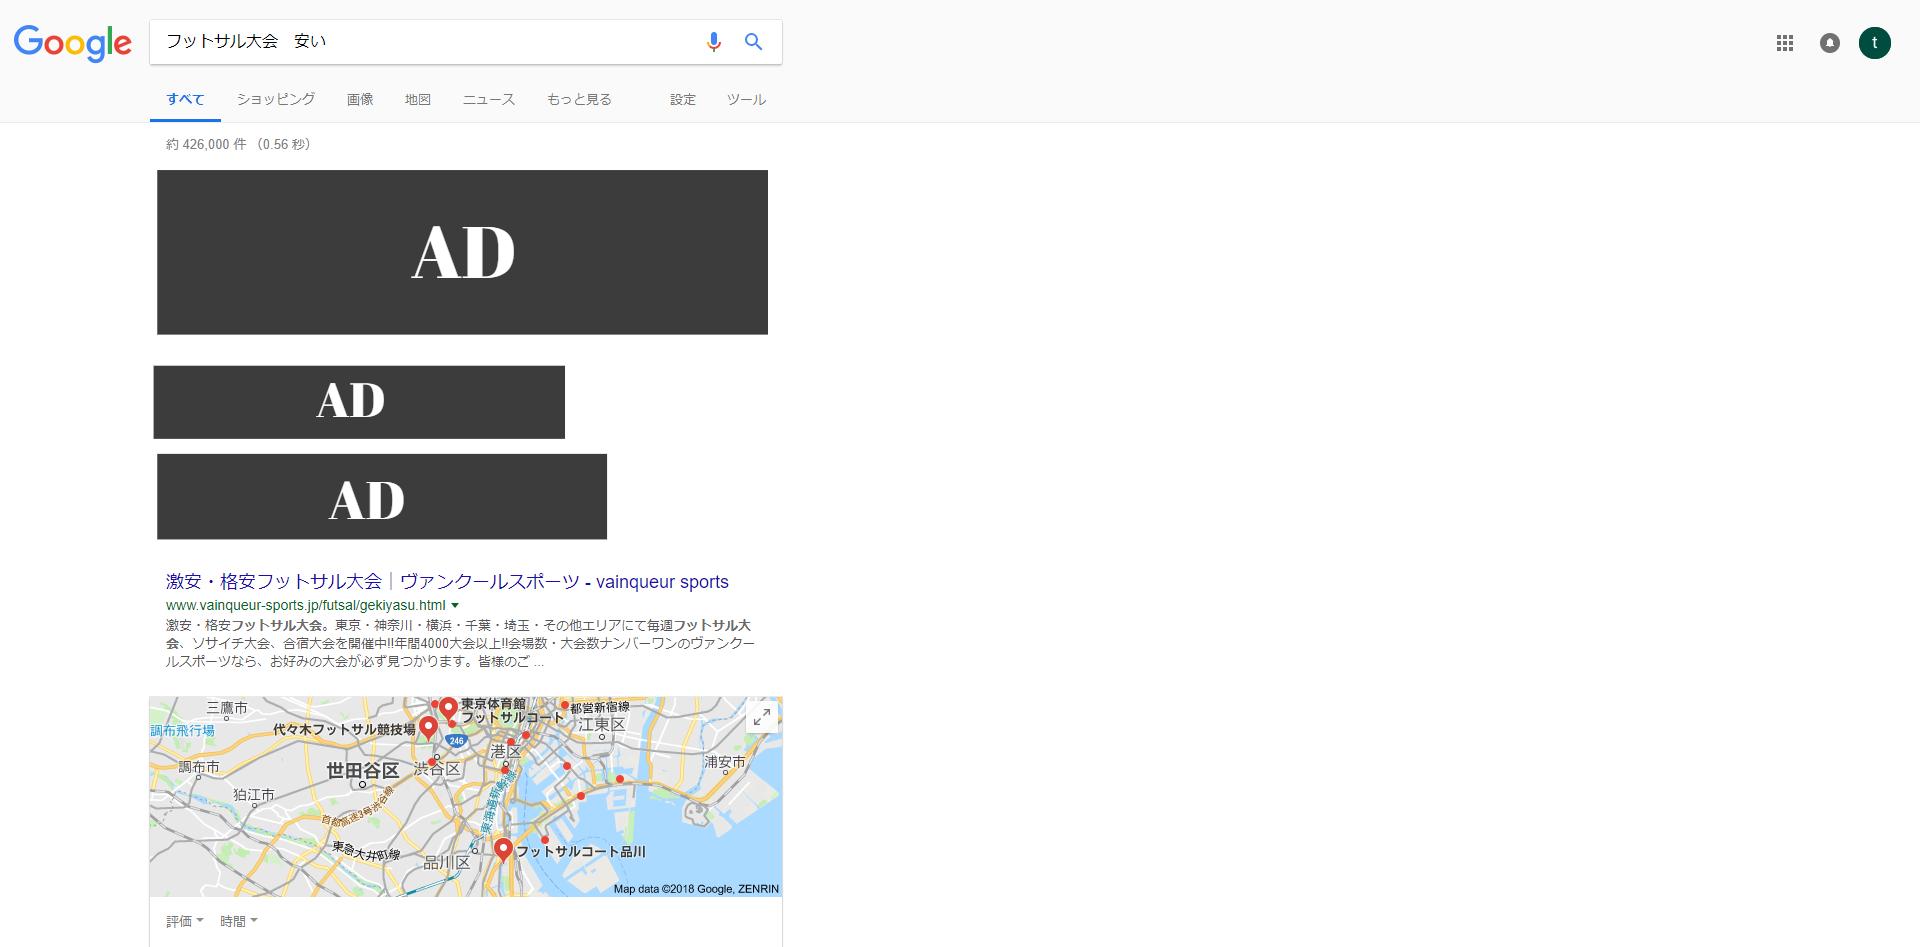 FireShot Capture 7 - フットサル大会 安い - Google 検索_ - https___wwwgooglecojp_search (1)